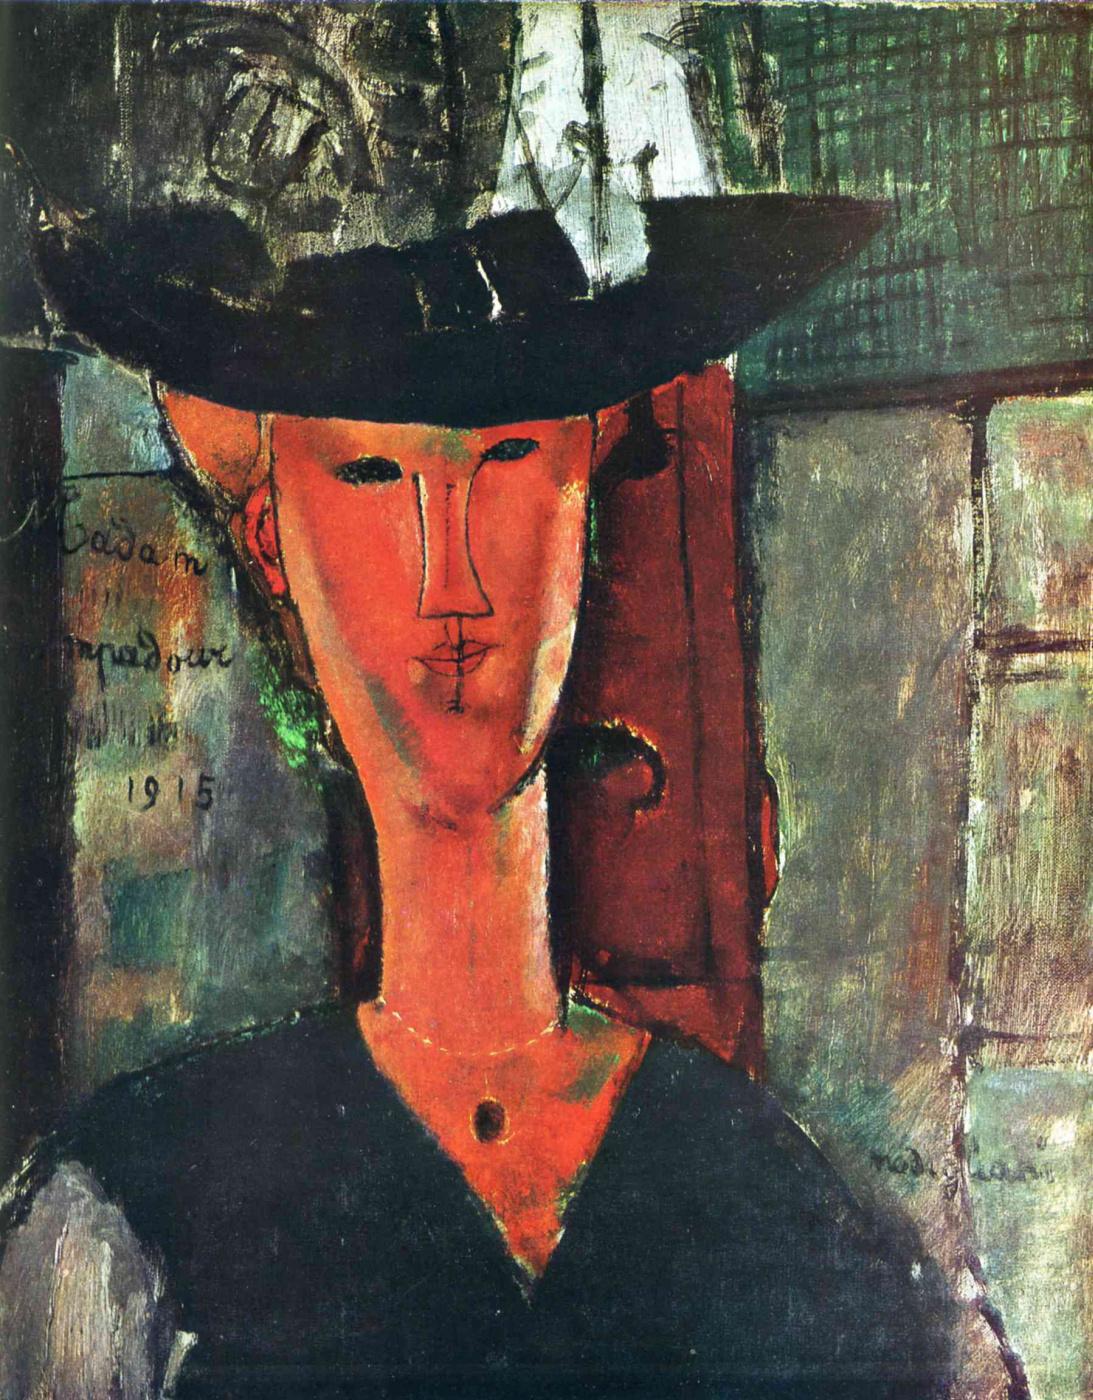 Amedeo Modigliani. Madame Pompadour. Portrait Of Beatrice Hastings